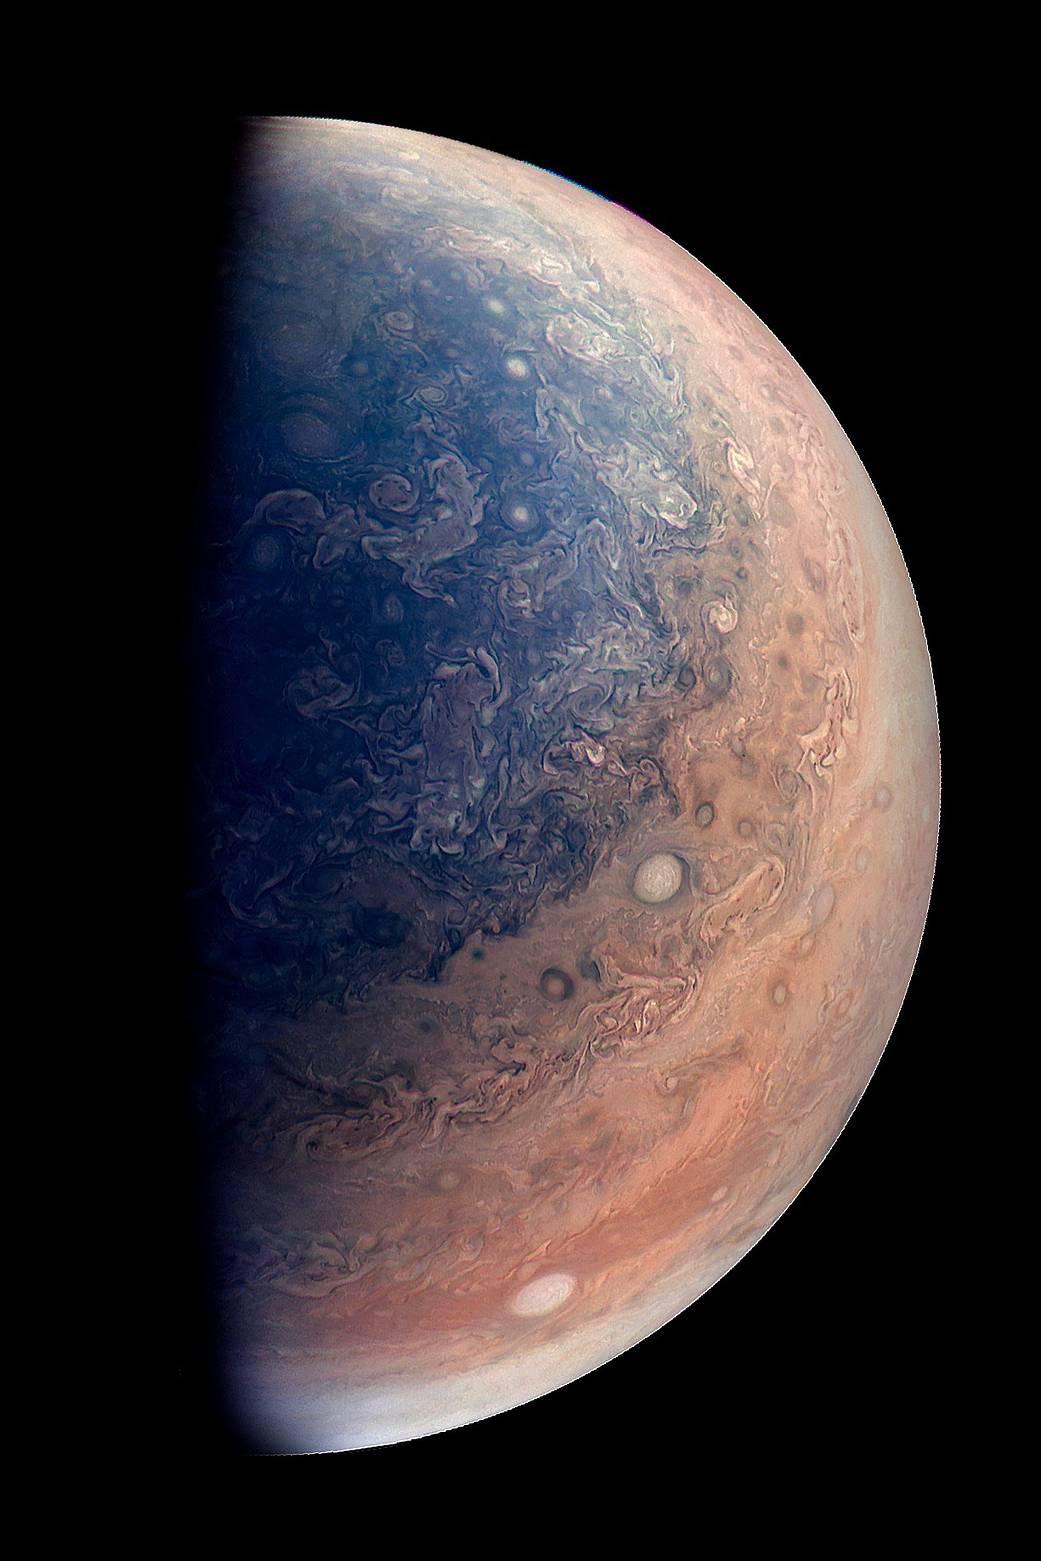 Noi imagini cu Jupiter capturate de sonda Juno arata superb 137